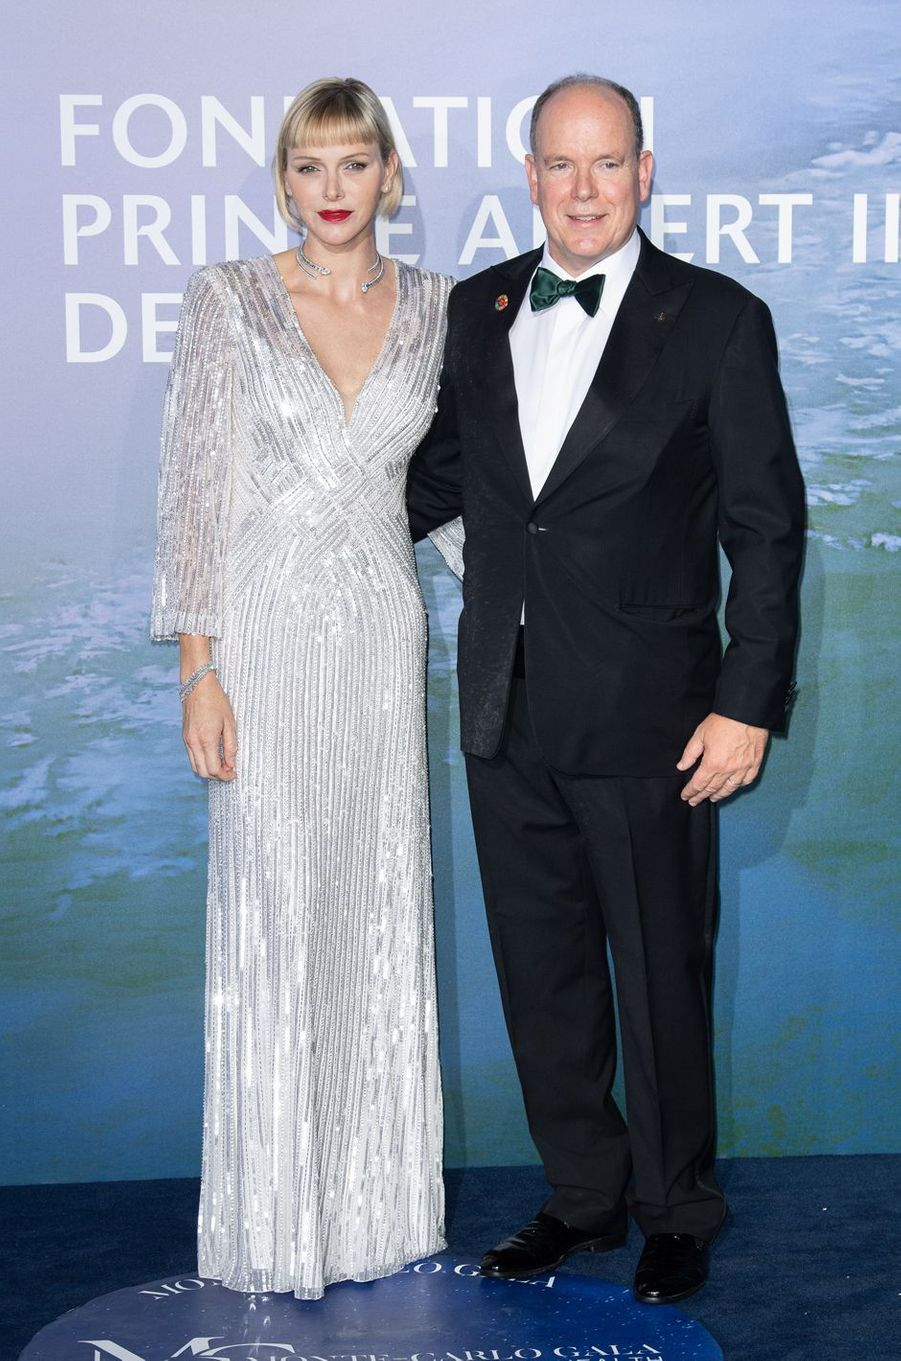 La princesse Charlène avec le prince Albert II de Monaco, le 24 septembre 2020